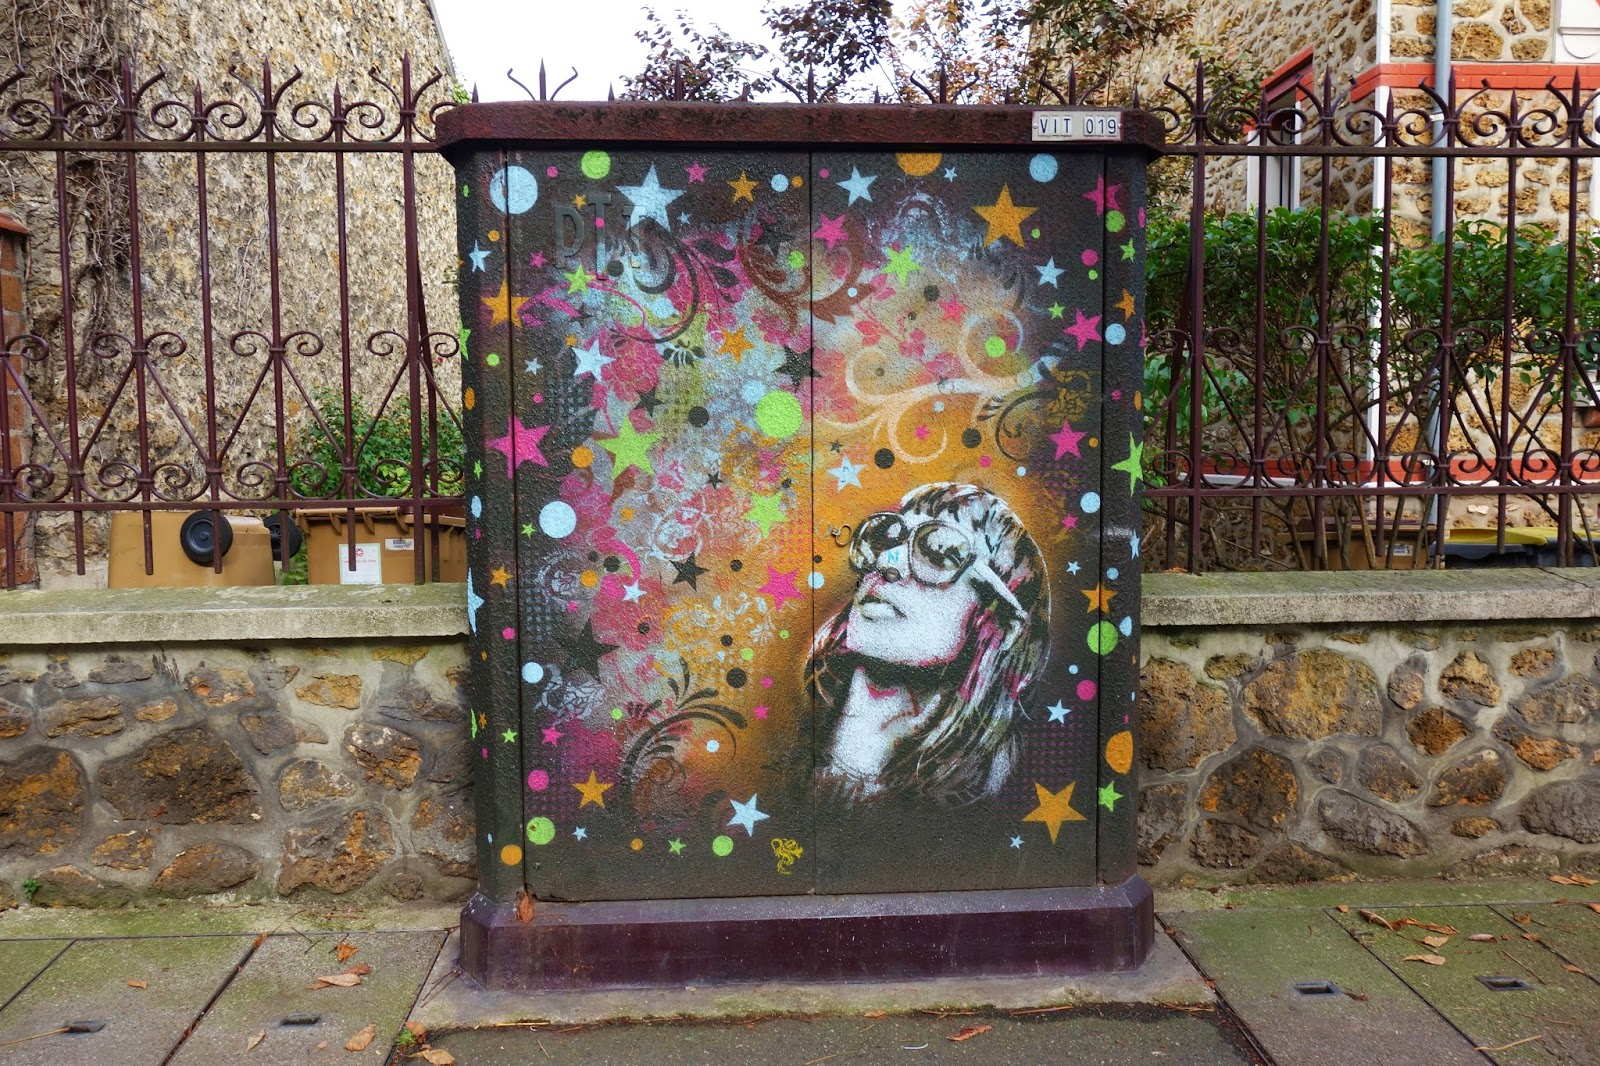 Sunday street art c215 avenue jean jaur s vitry sur - Piscine avec pente douce vitry sur seine ...